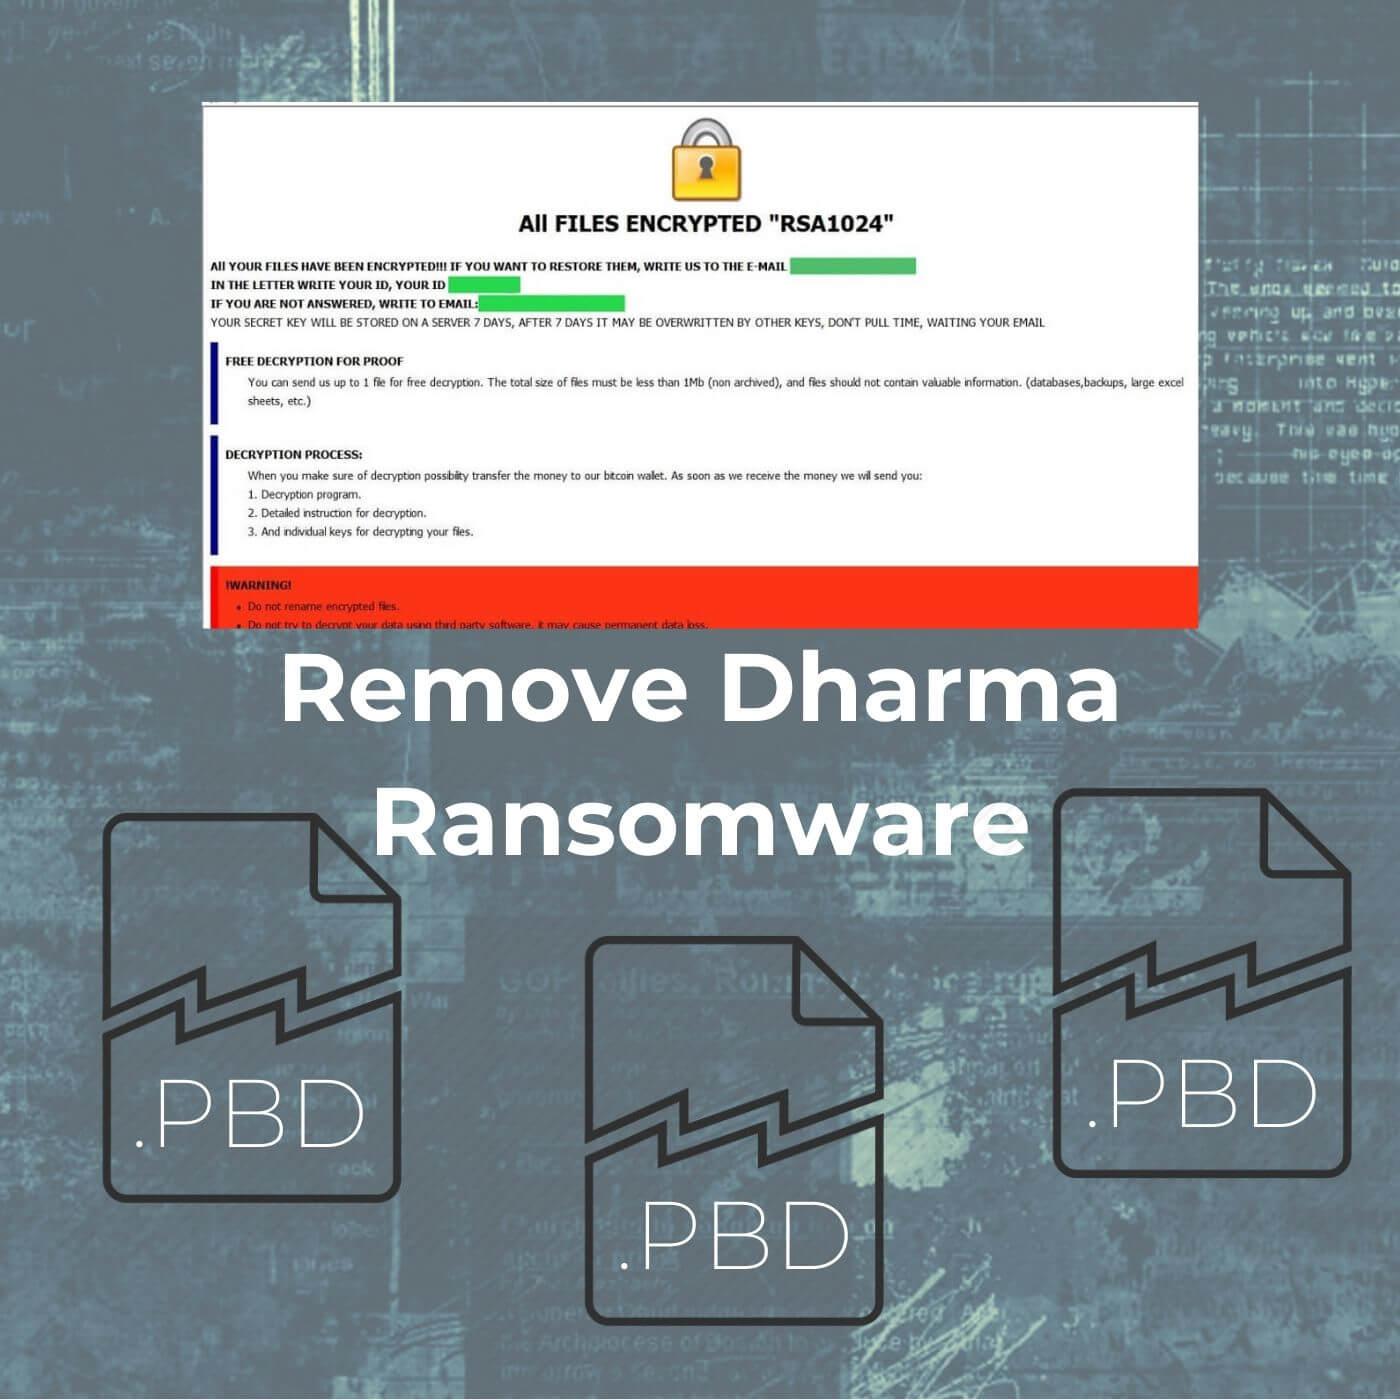 remove pbd virus restore pbd files sensorstechforum removal guide